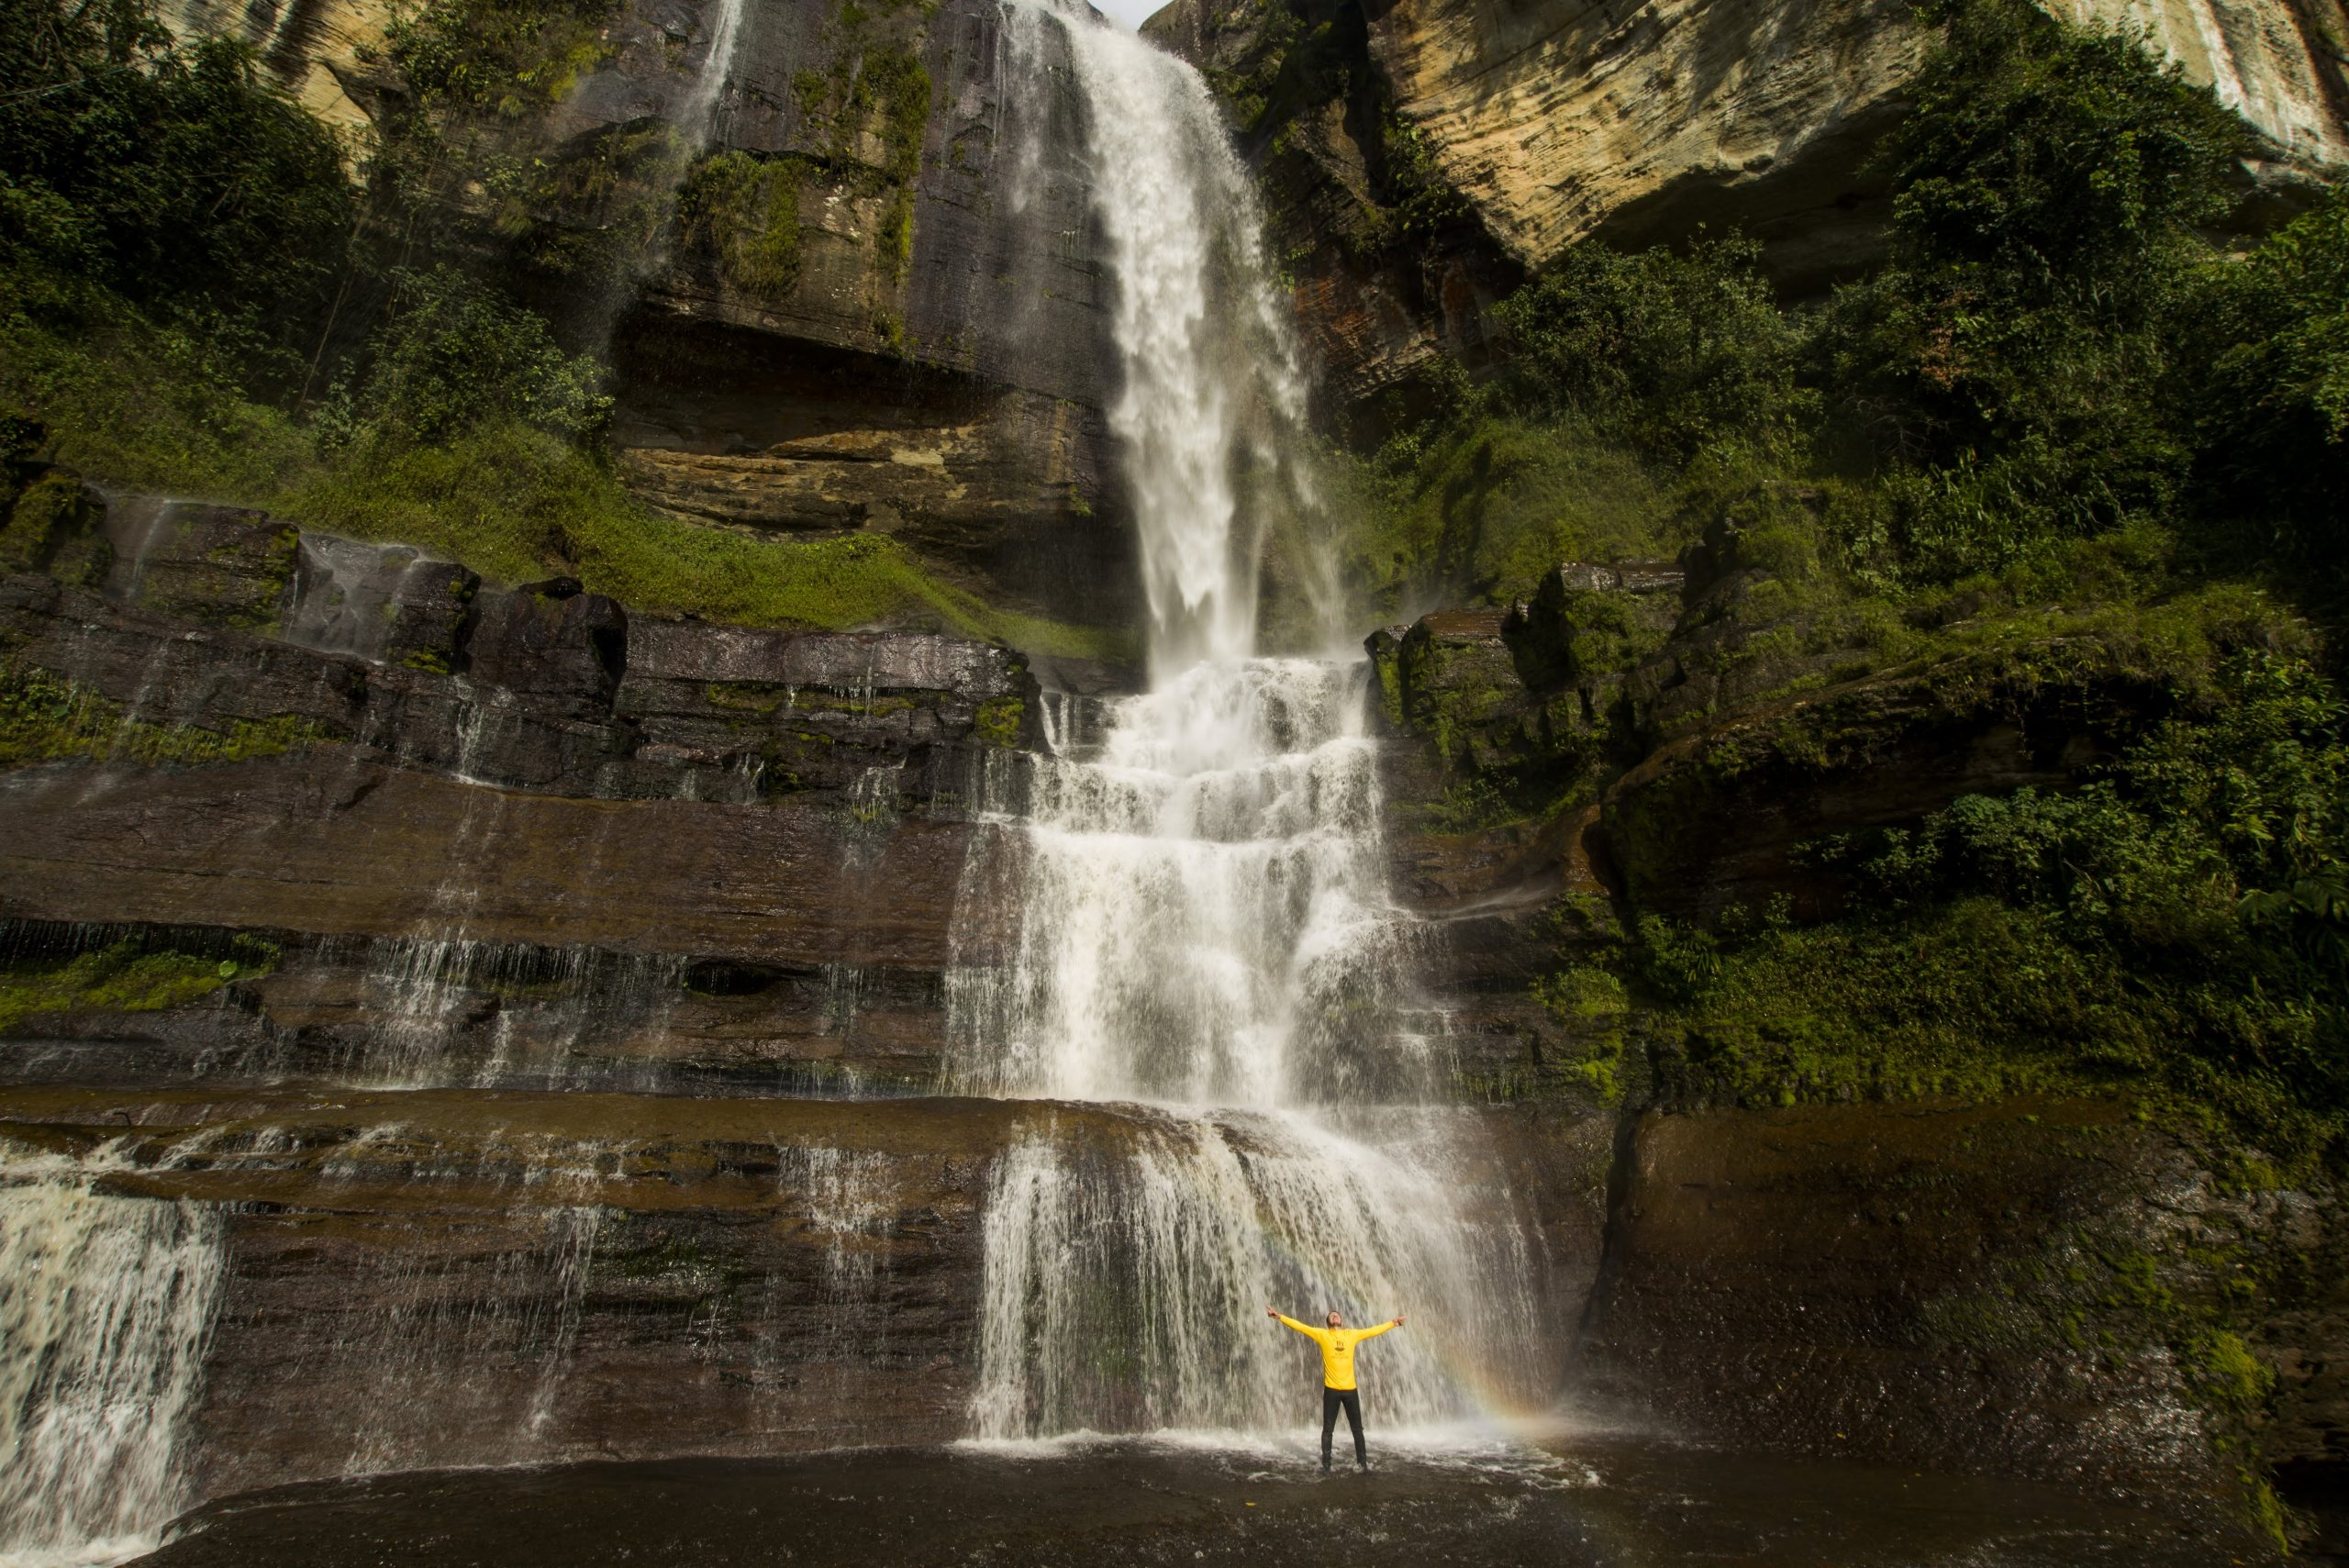 Cascada de los Caballeros. Foto: almasaventureras.com